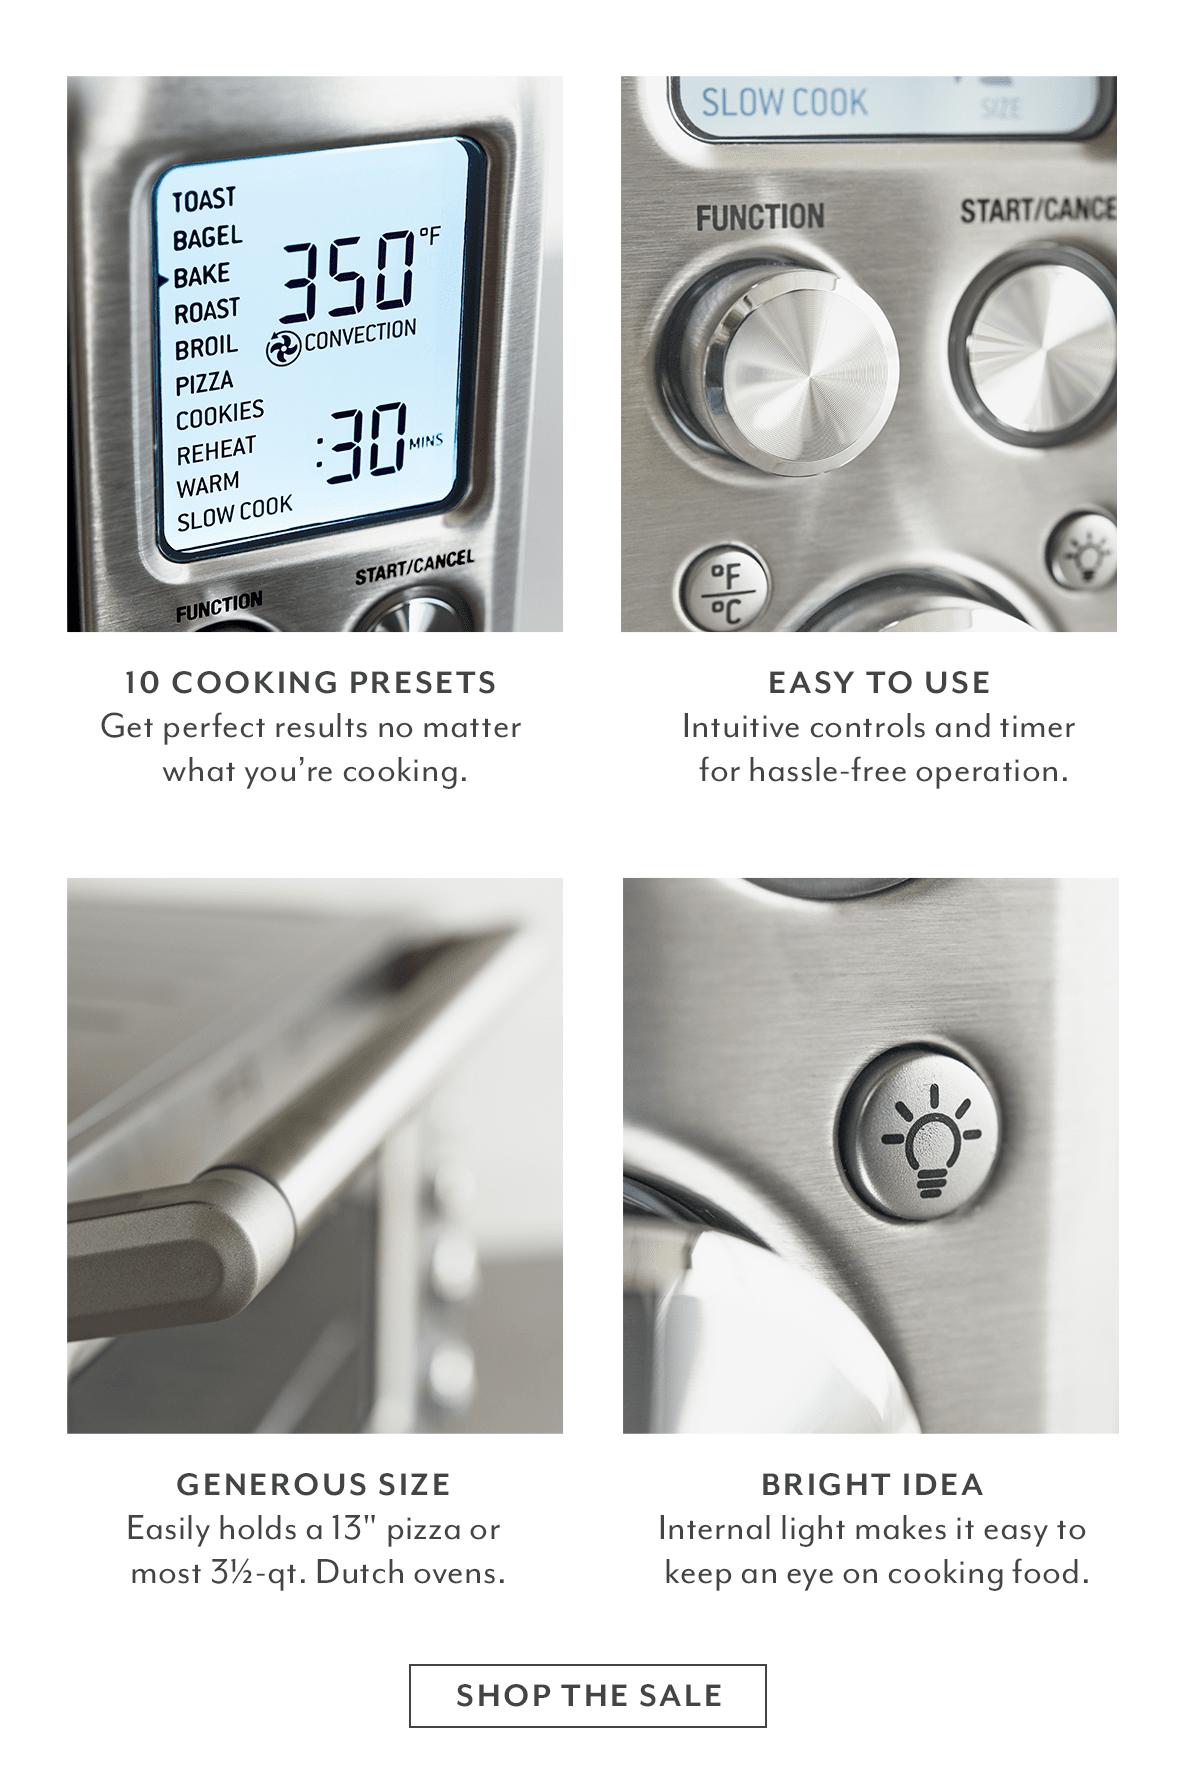 Breville Oven Pro